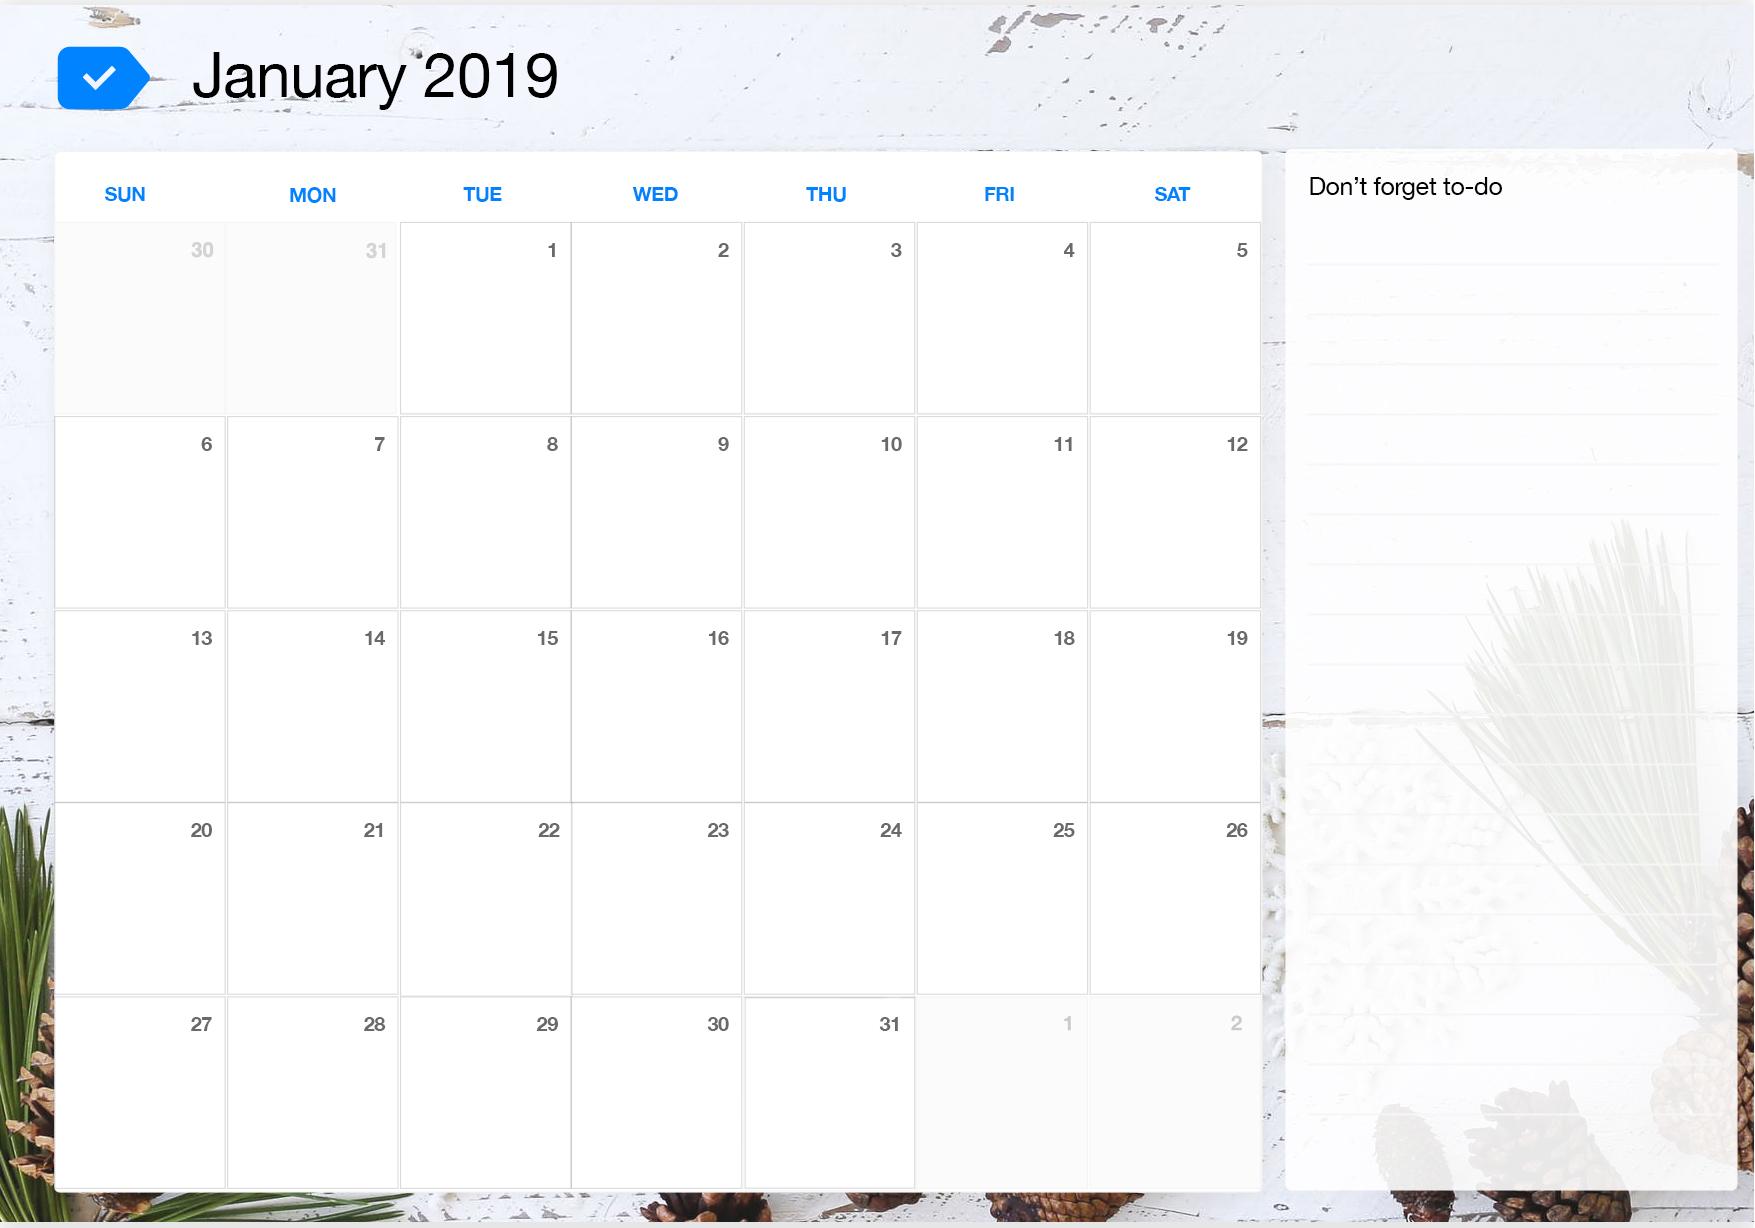 image about Printable Calendar -16 identify January 2019 Printable Calendar Any.do